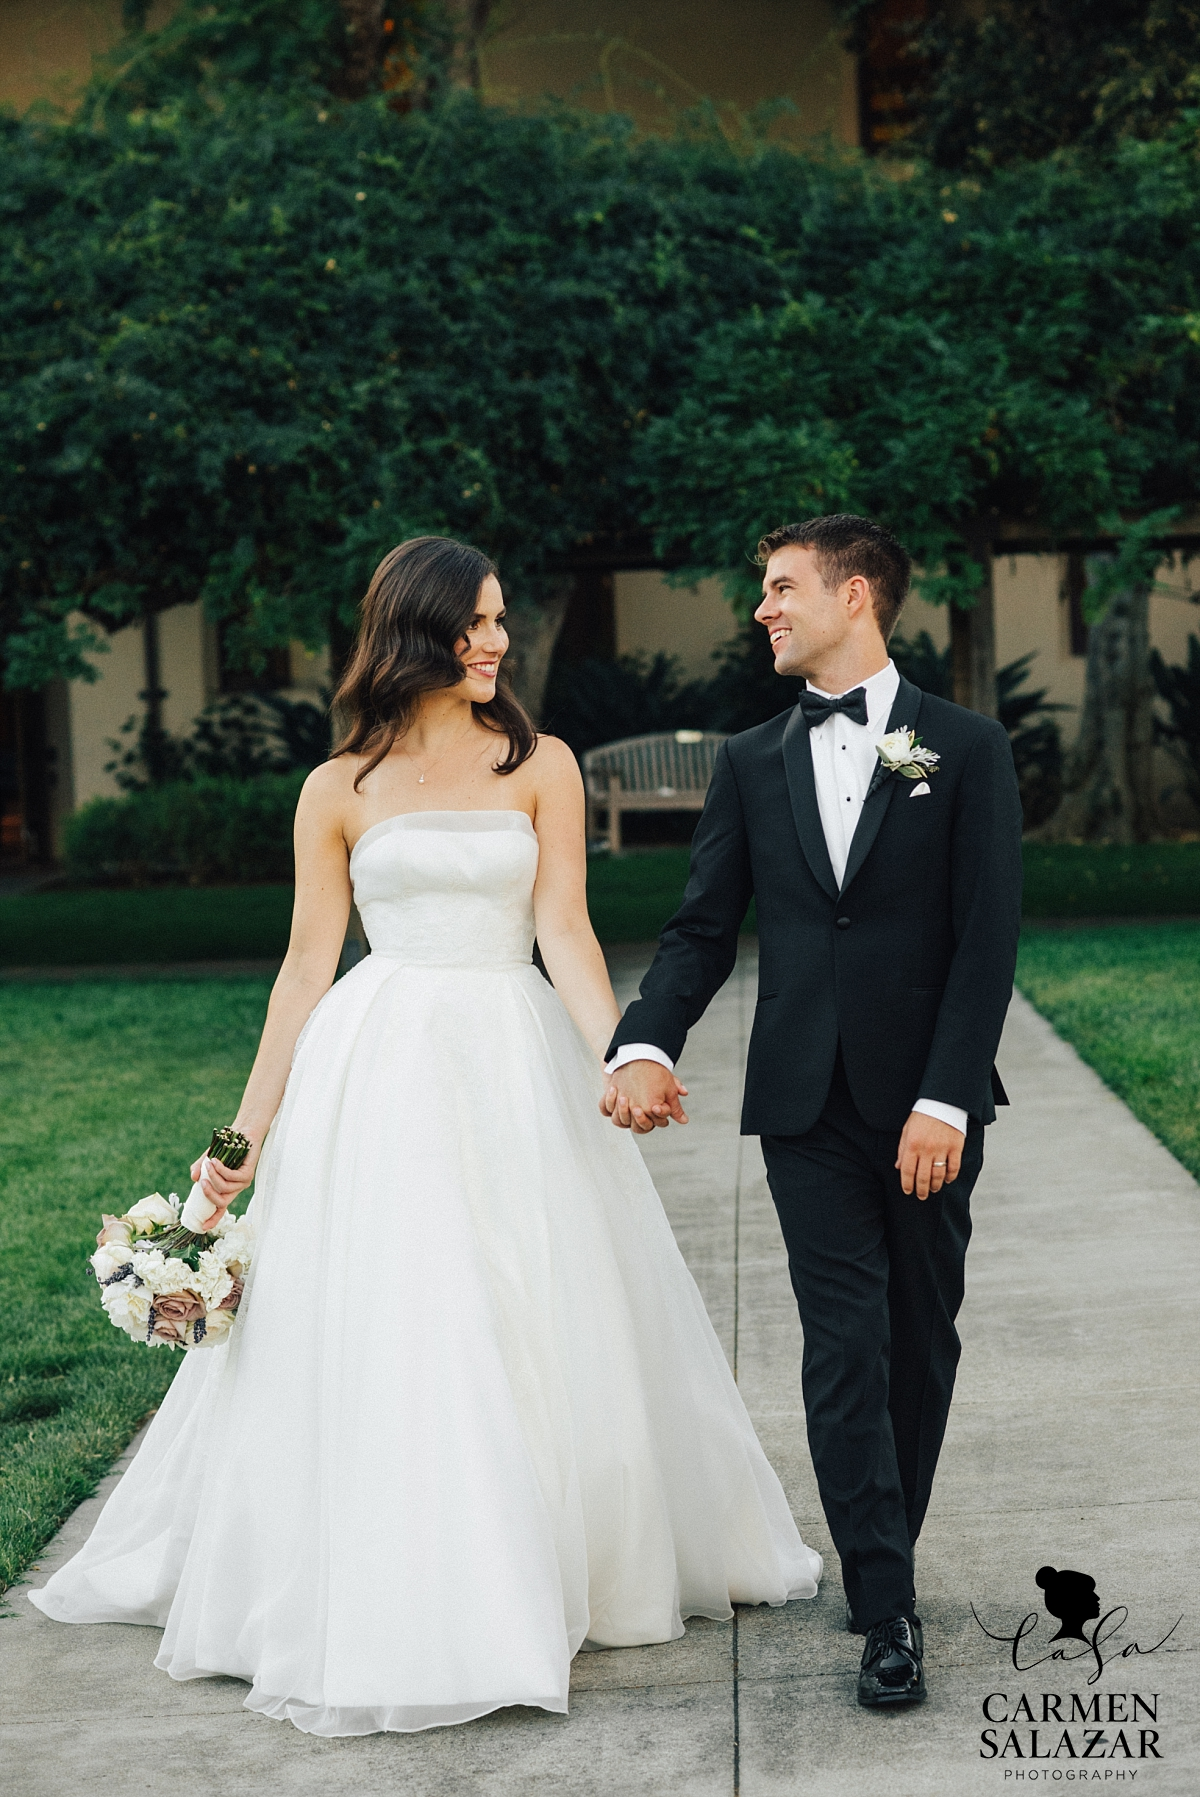 Santa Clara University alumnae wedding - Carmen Salazar